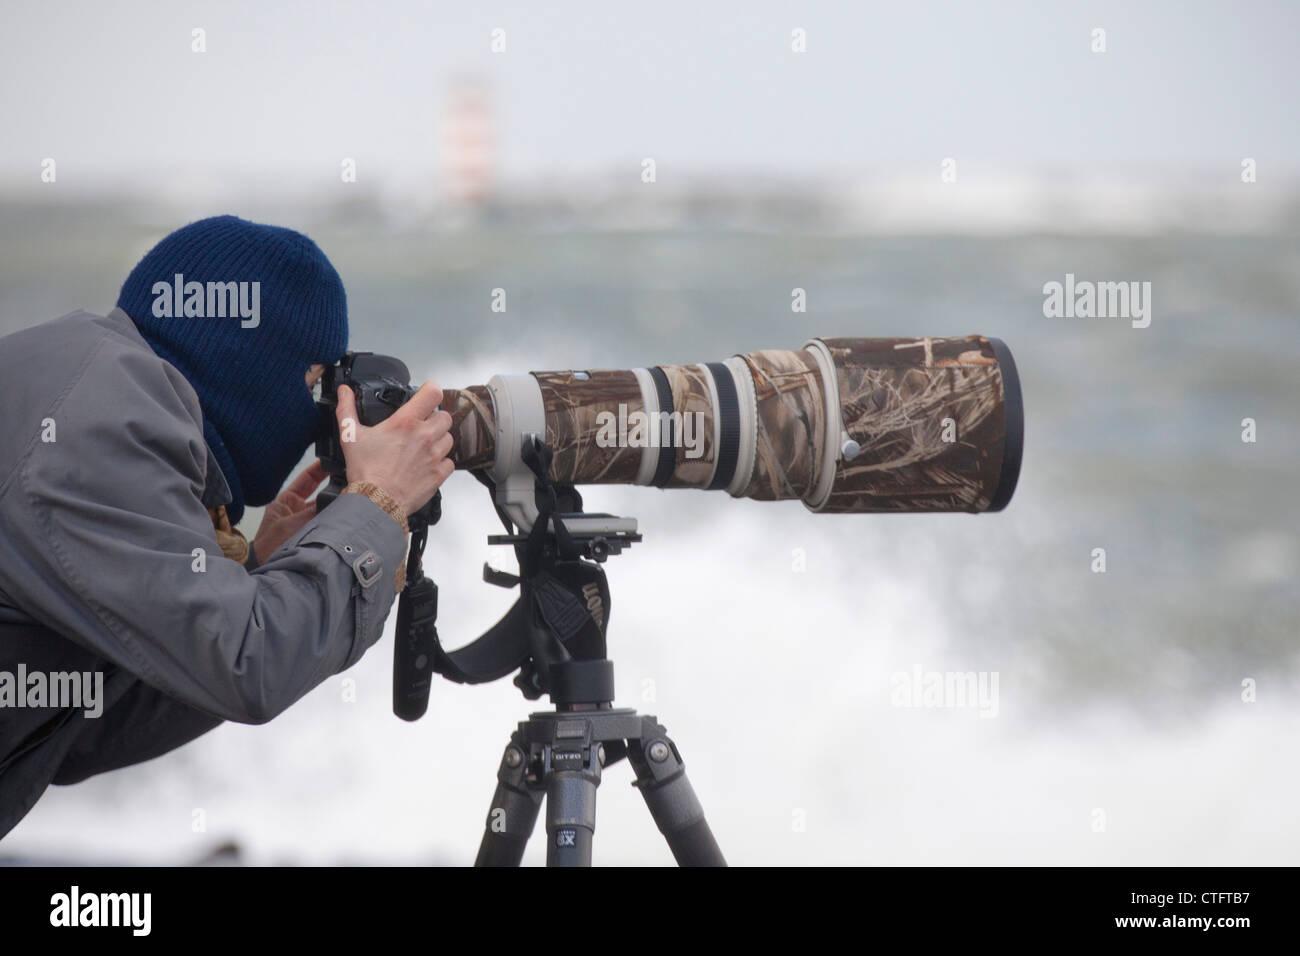 I Paesi Bassi, IJmuiden, fotografo Marjolijn van Steeden sul molo durante la tempesta. Immagini Stock